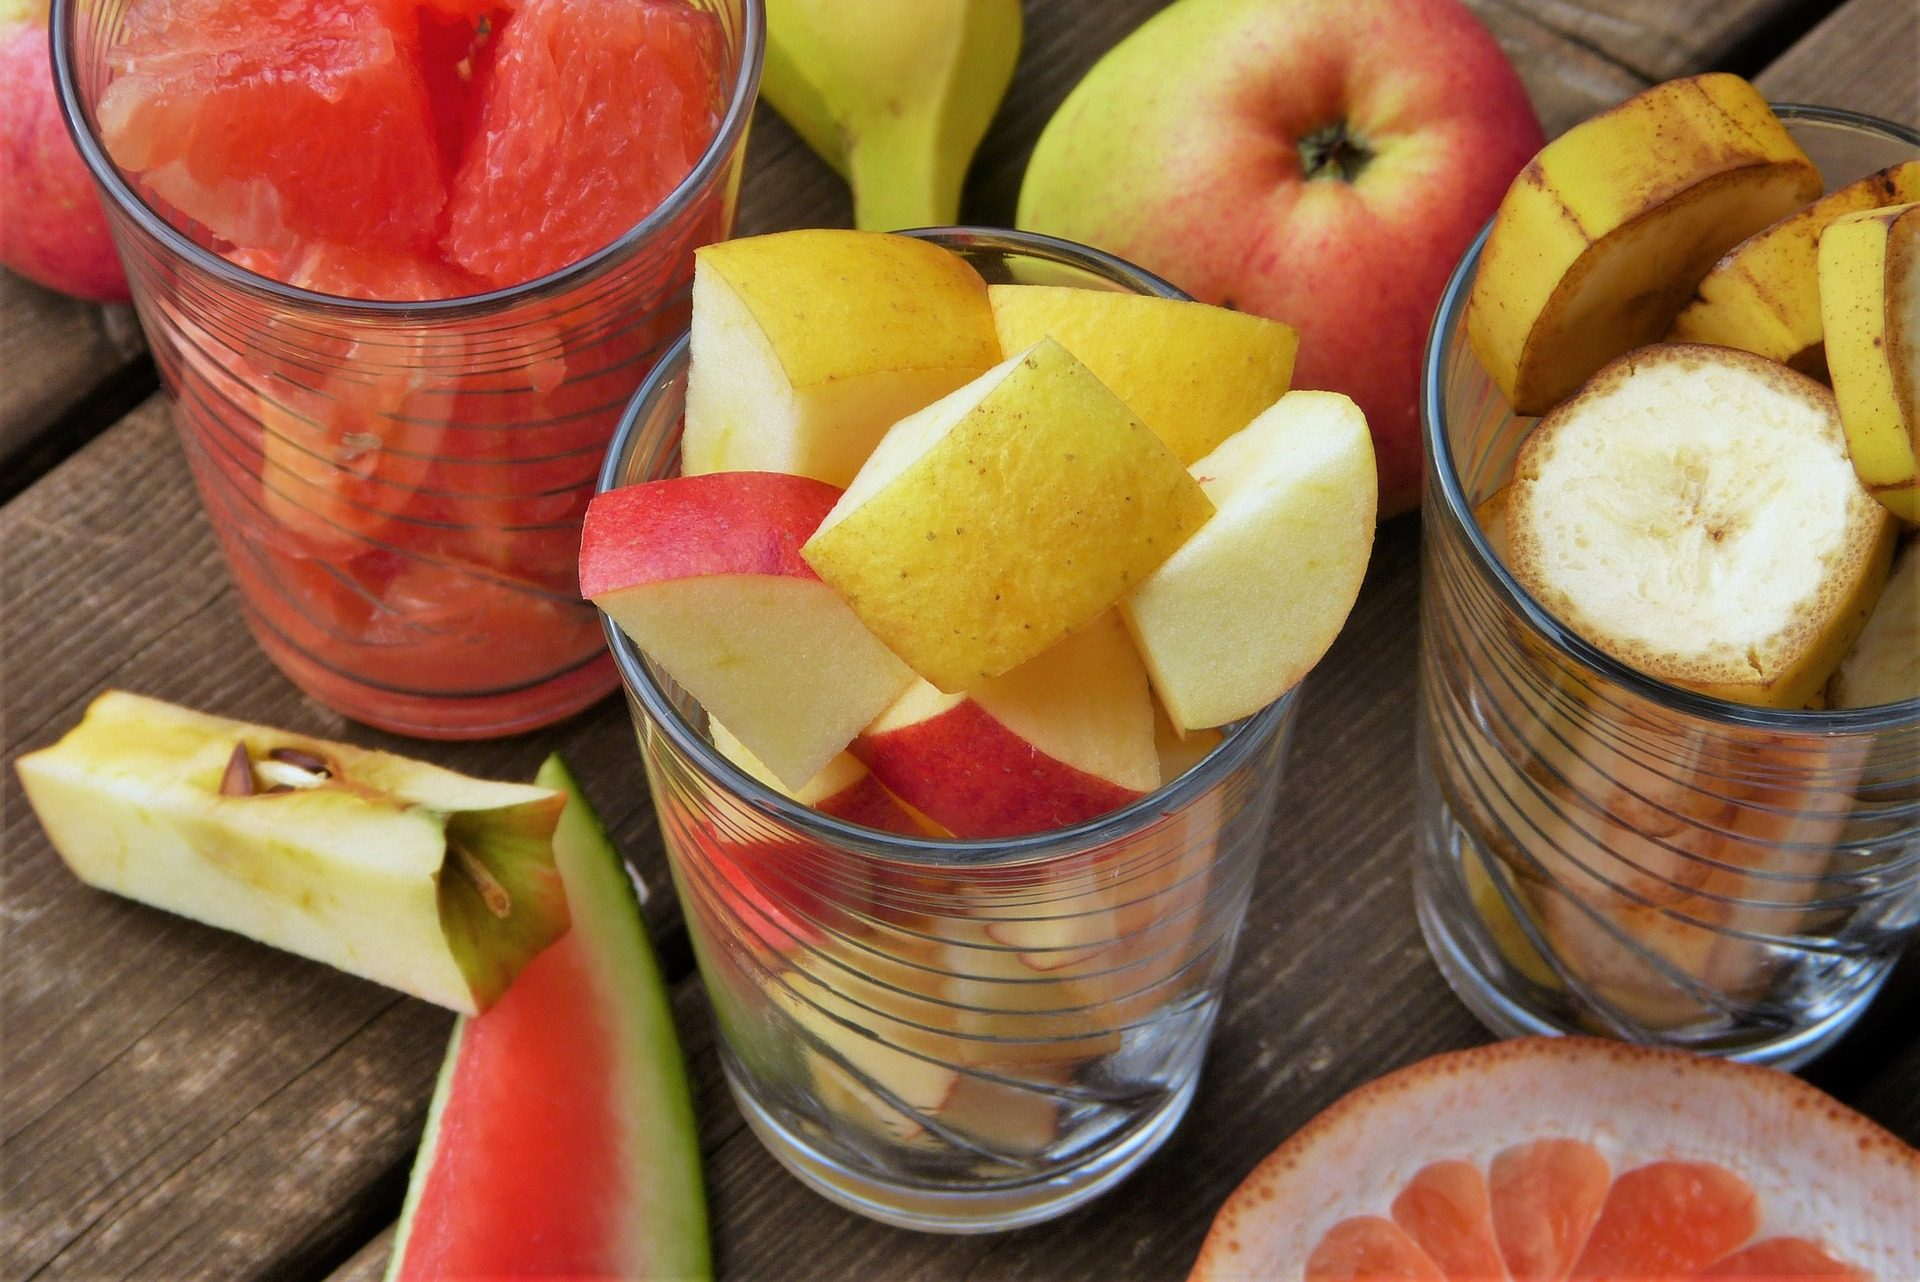 frutta, navi, Cristallo, Apple, Anguria, banane - Sfondi HD - Professor-falken.com